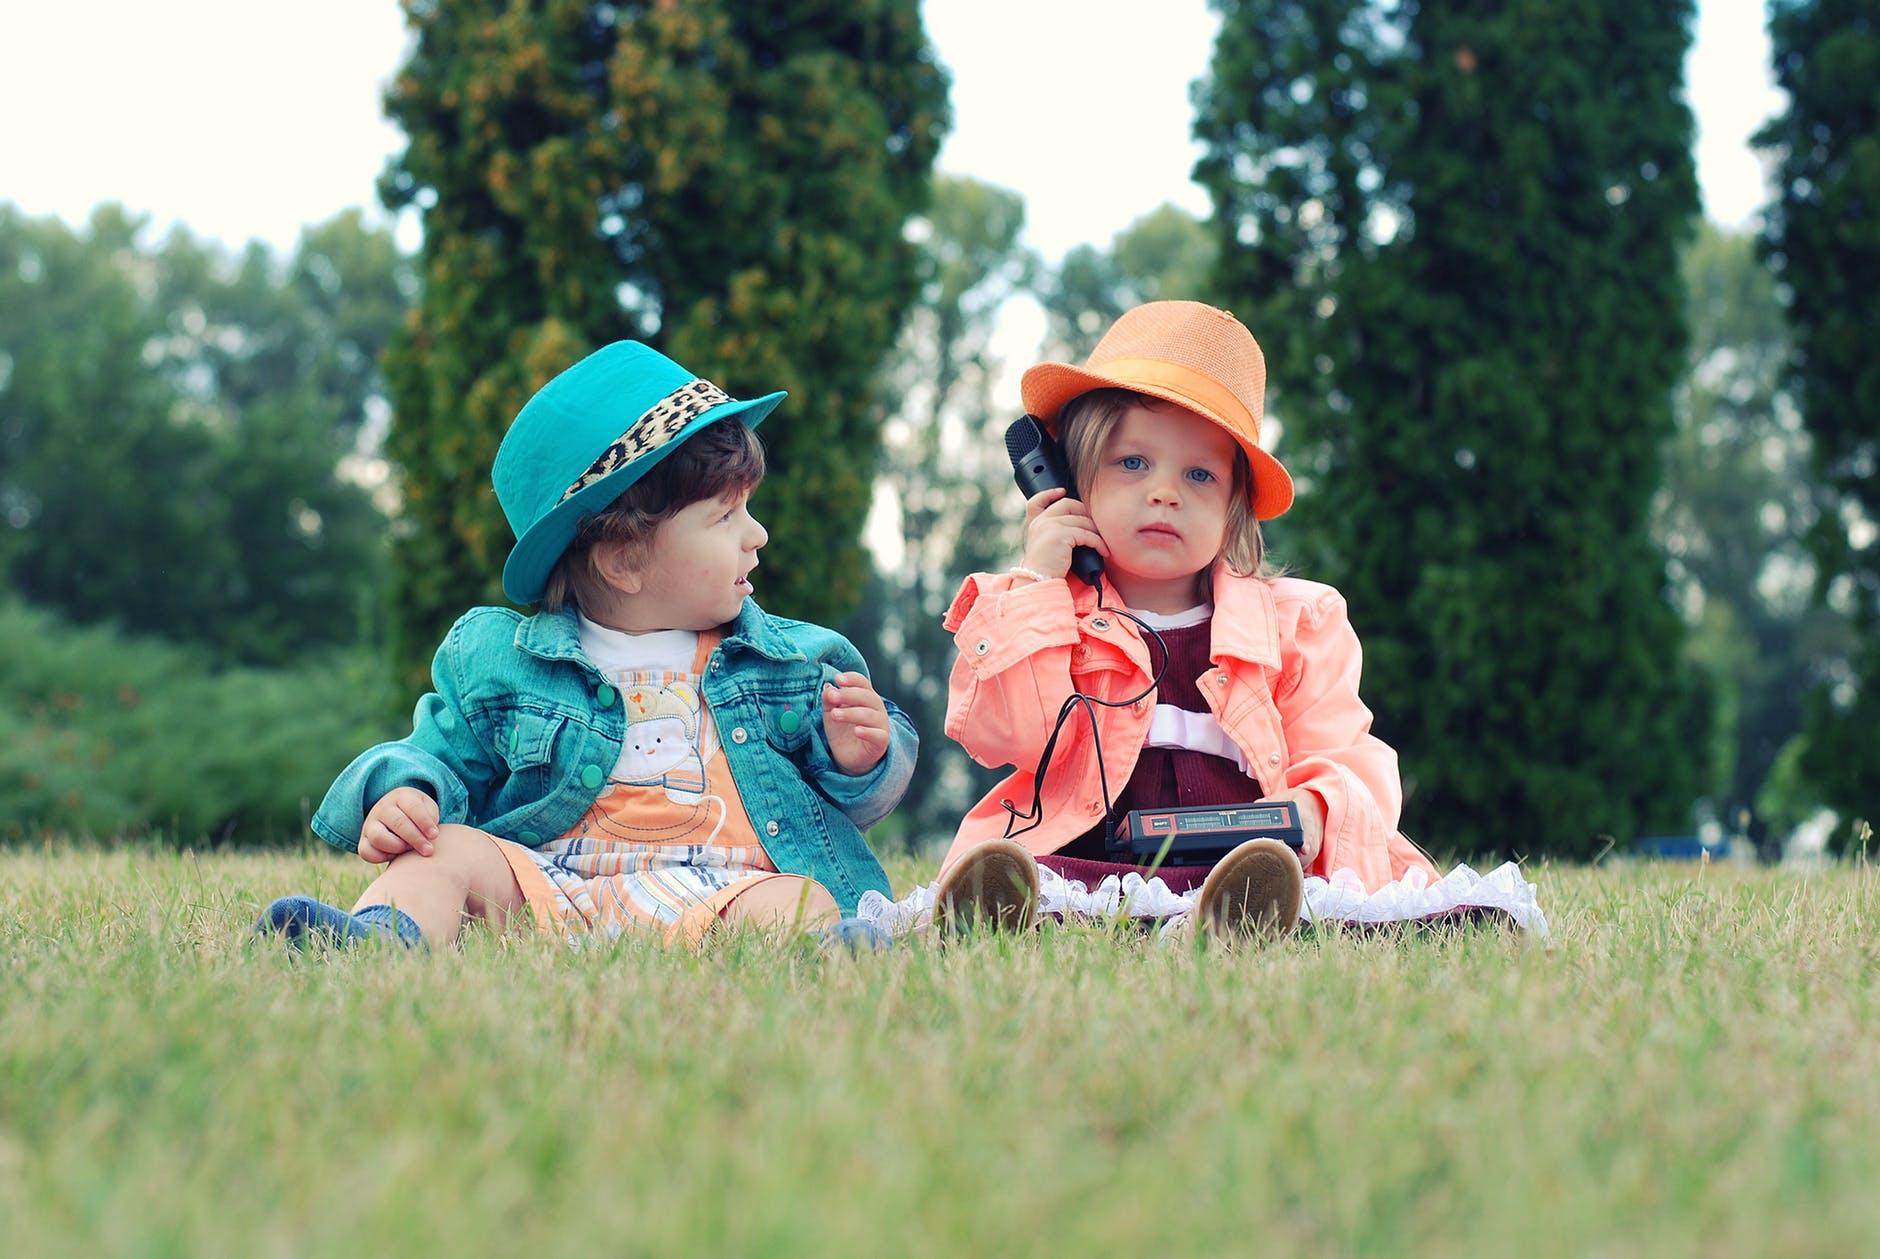 dijete razvoj govor